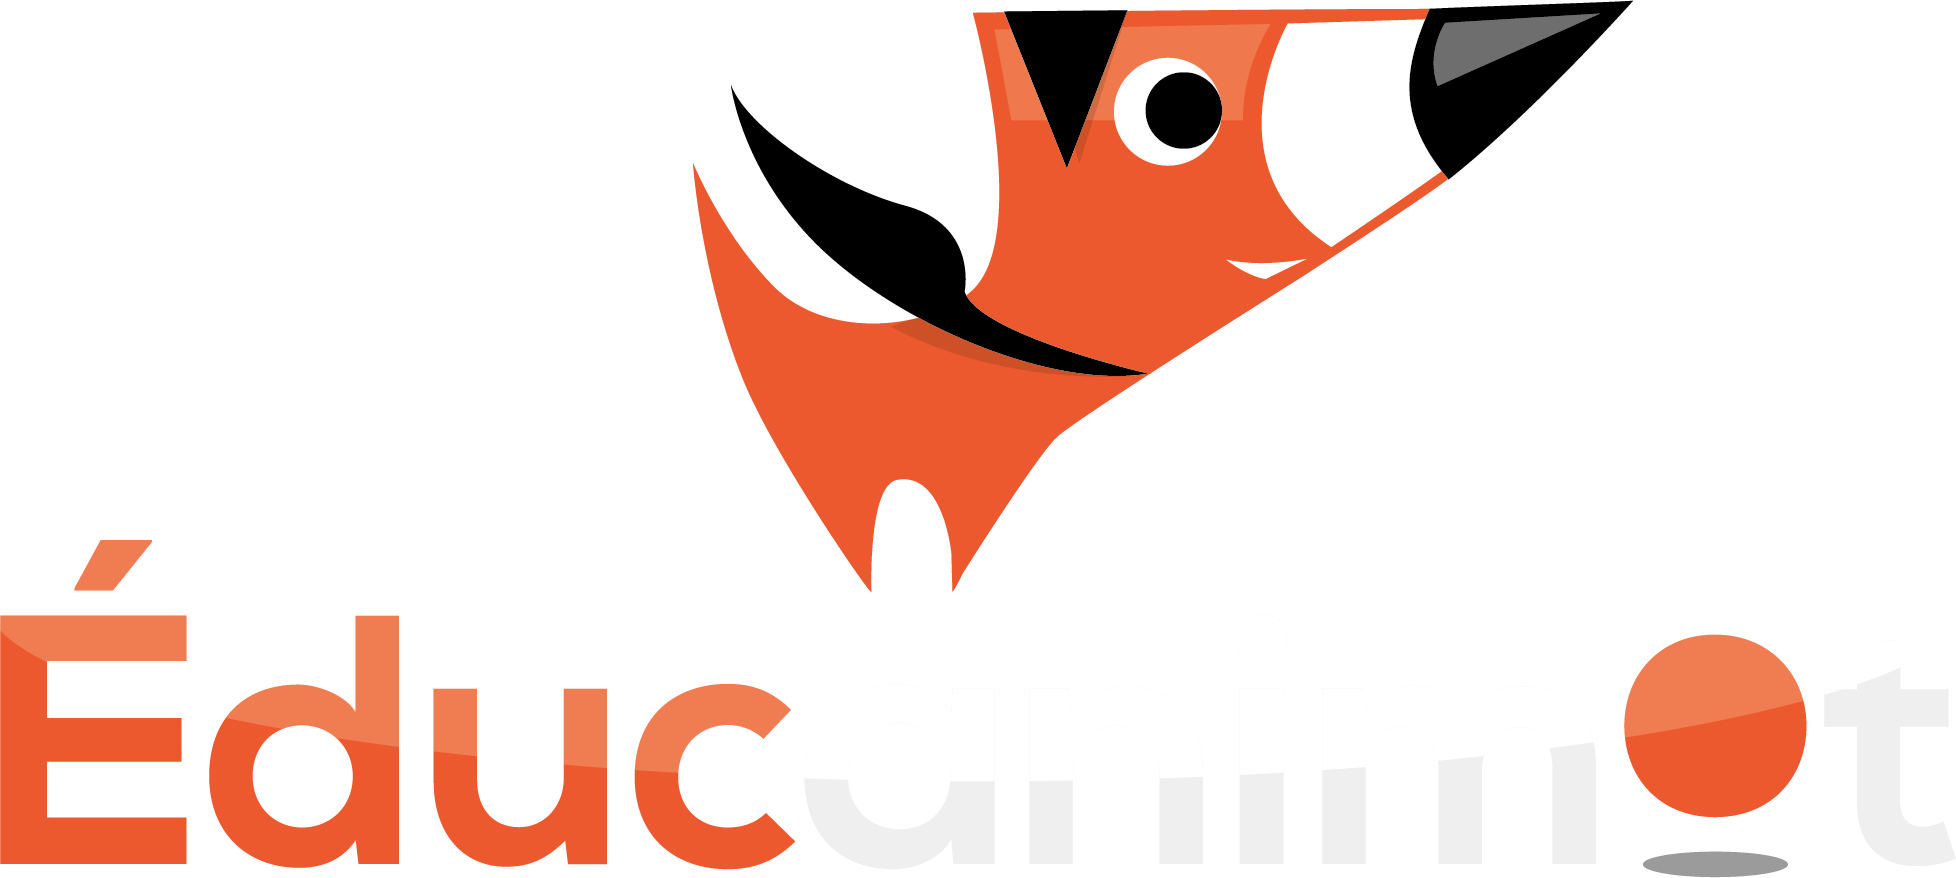 Educanimot Logo